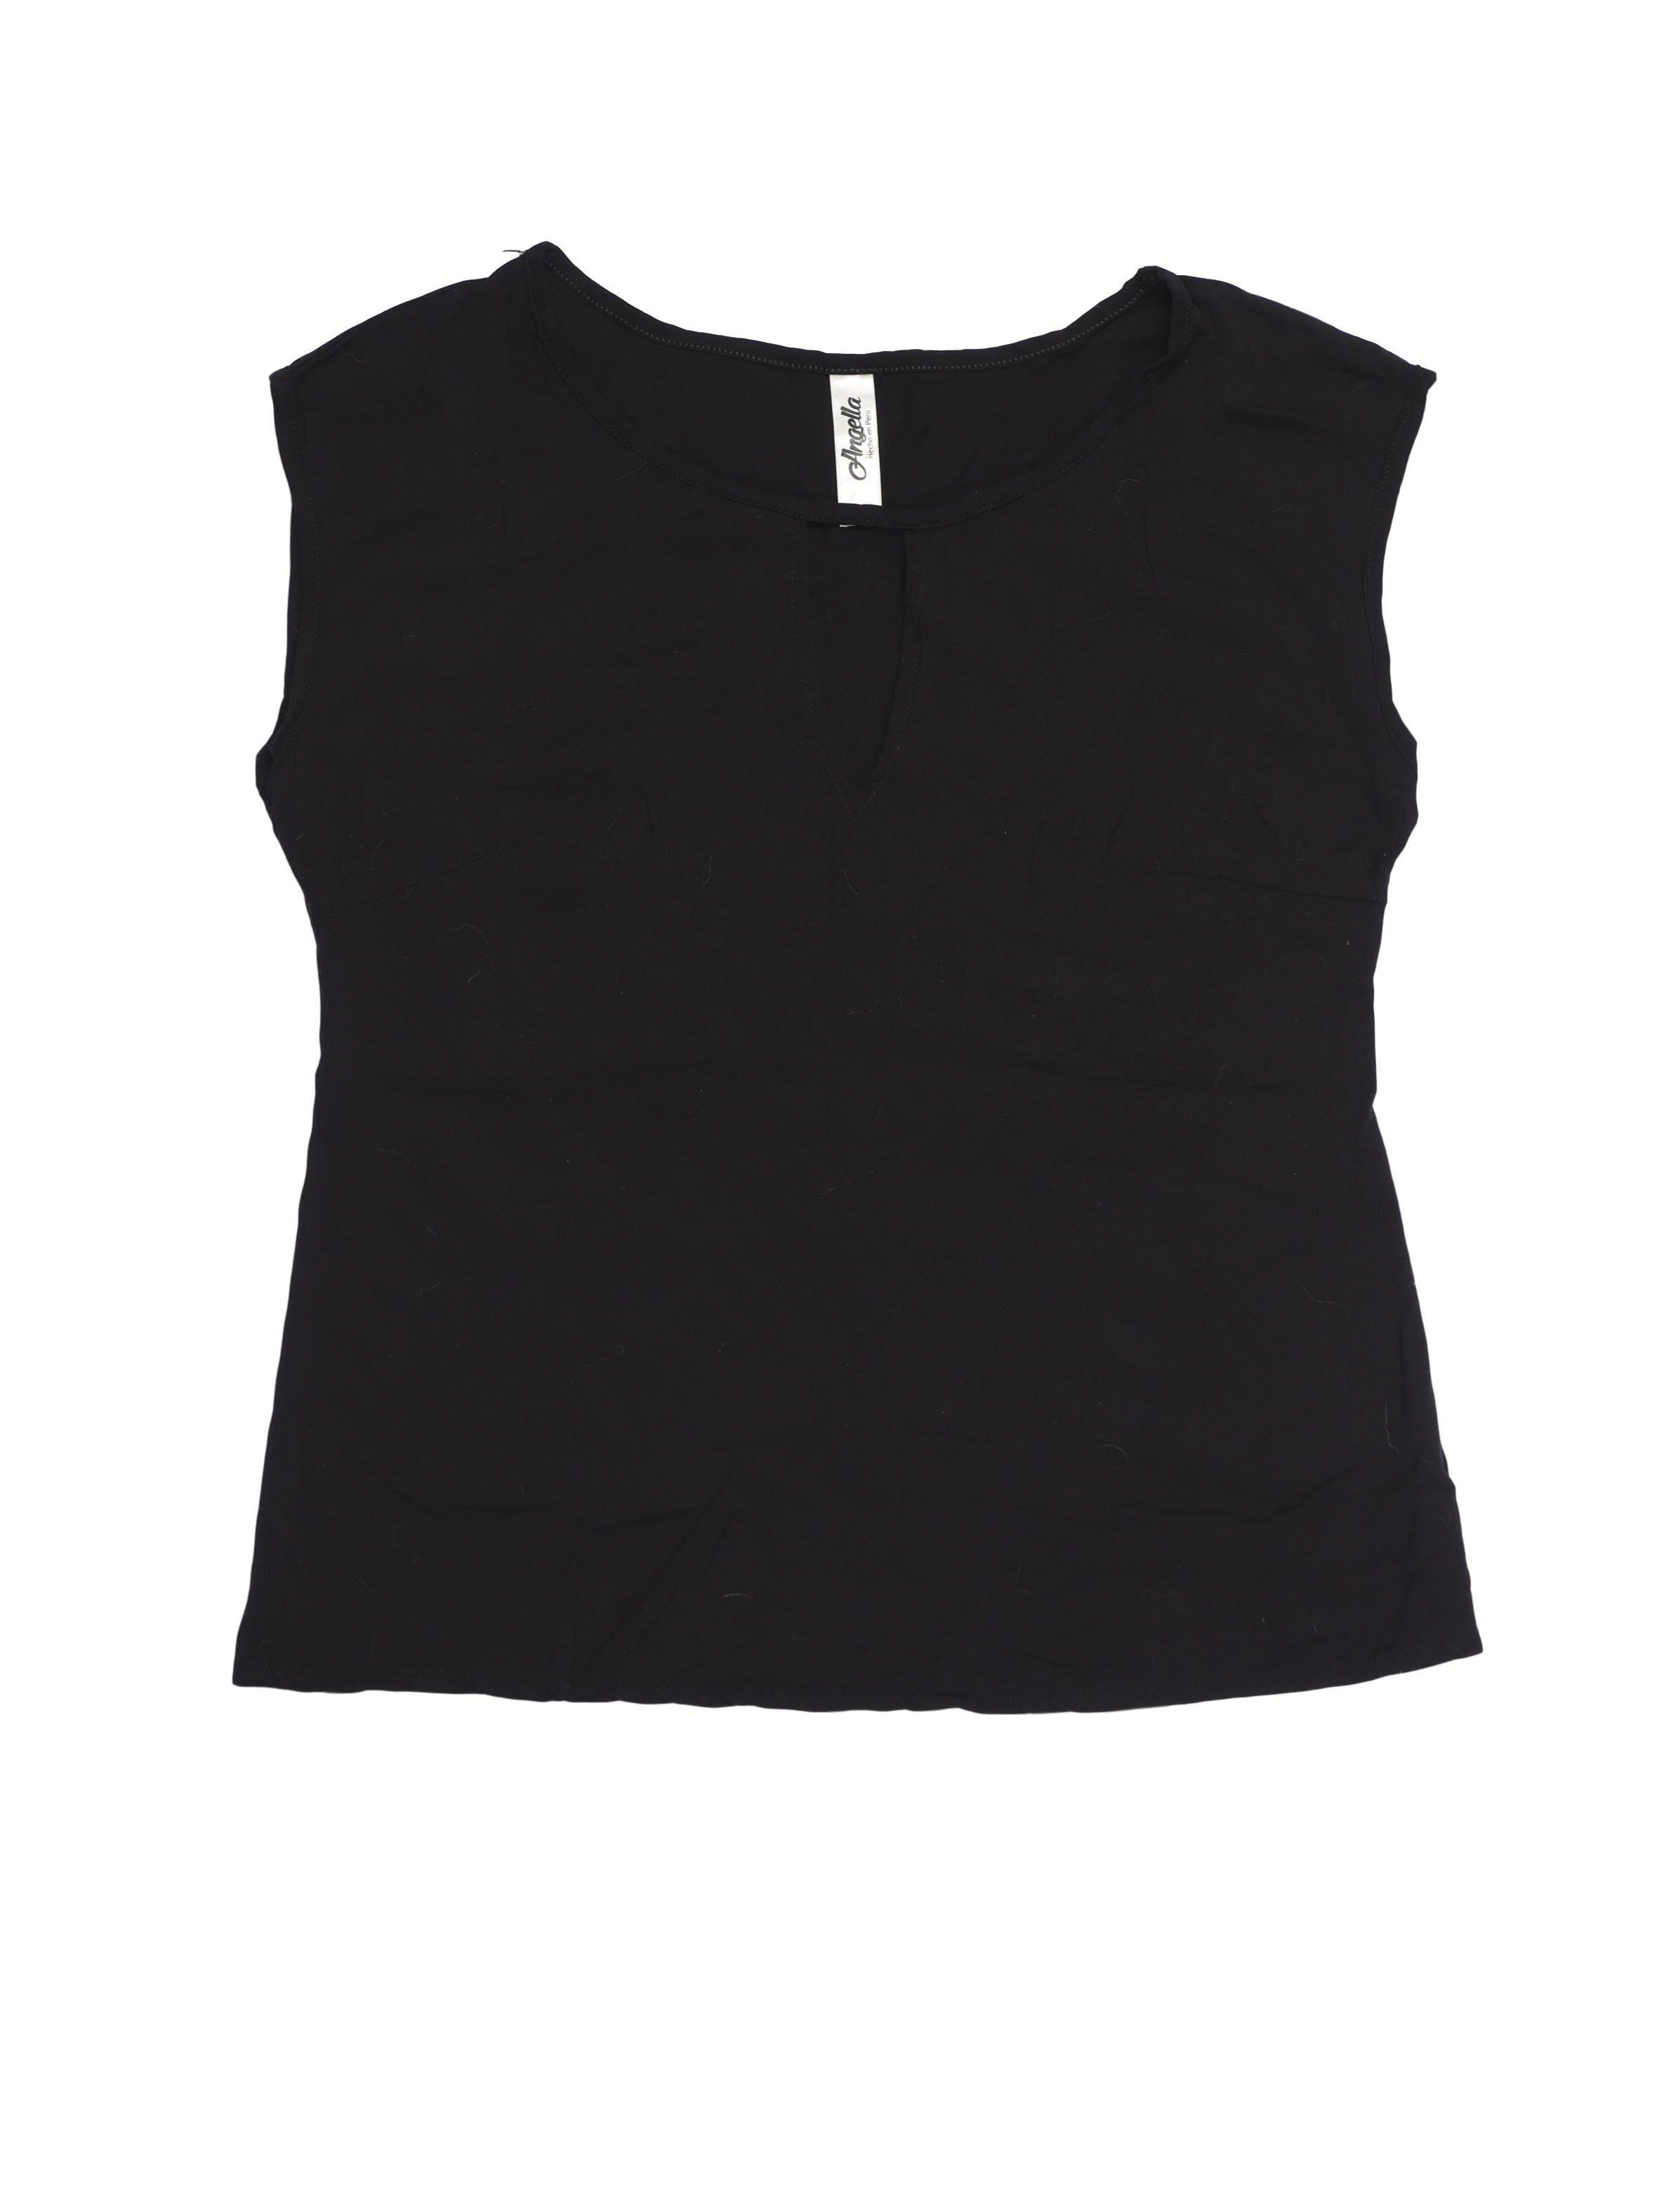 Blusa negra tipo chalis con escote gota en pecho